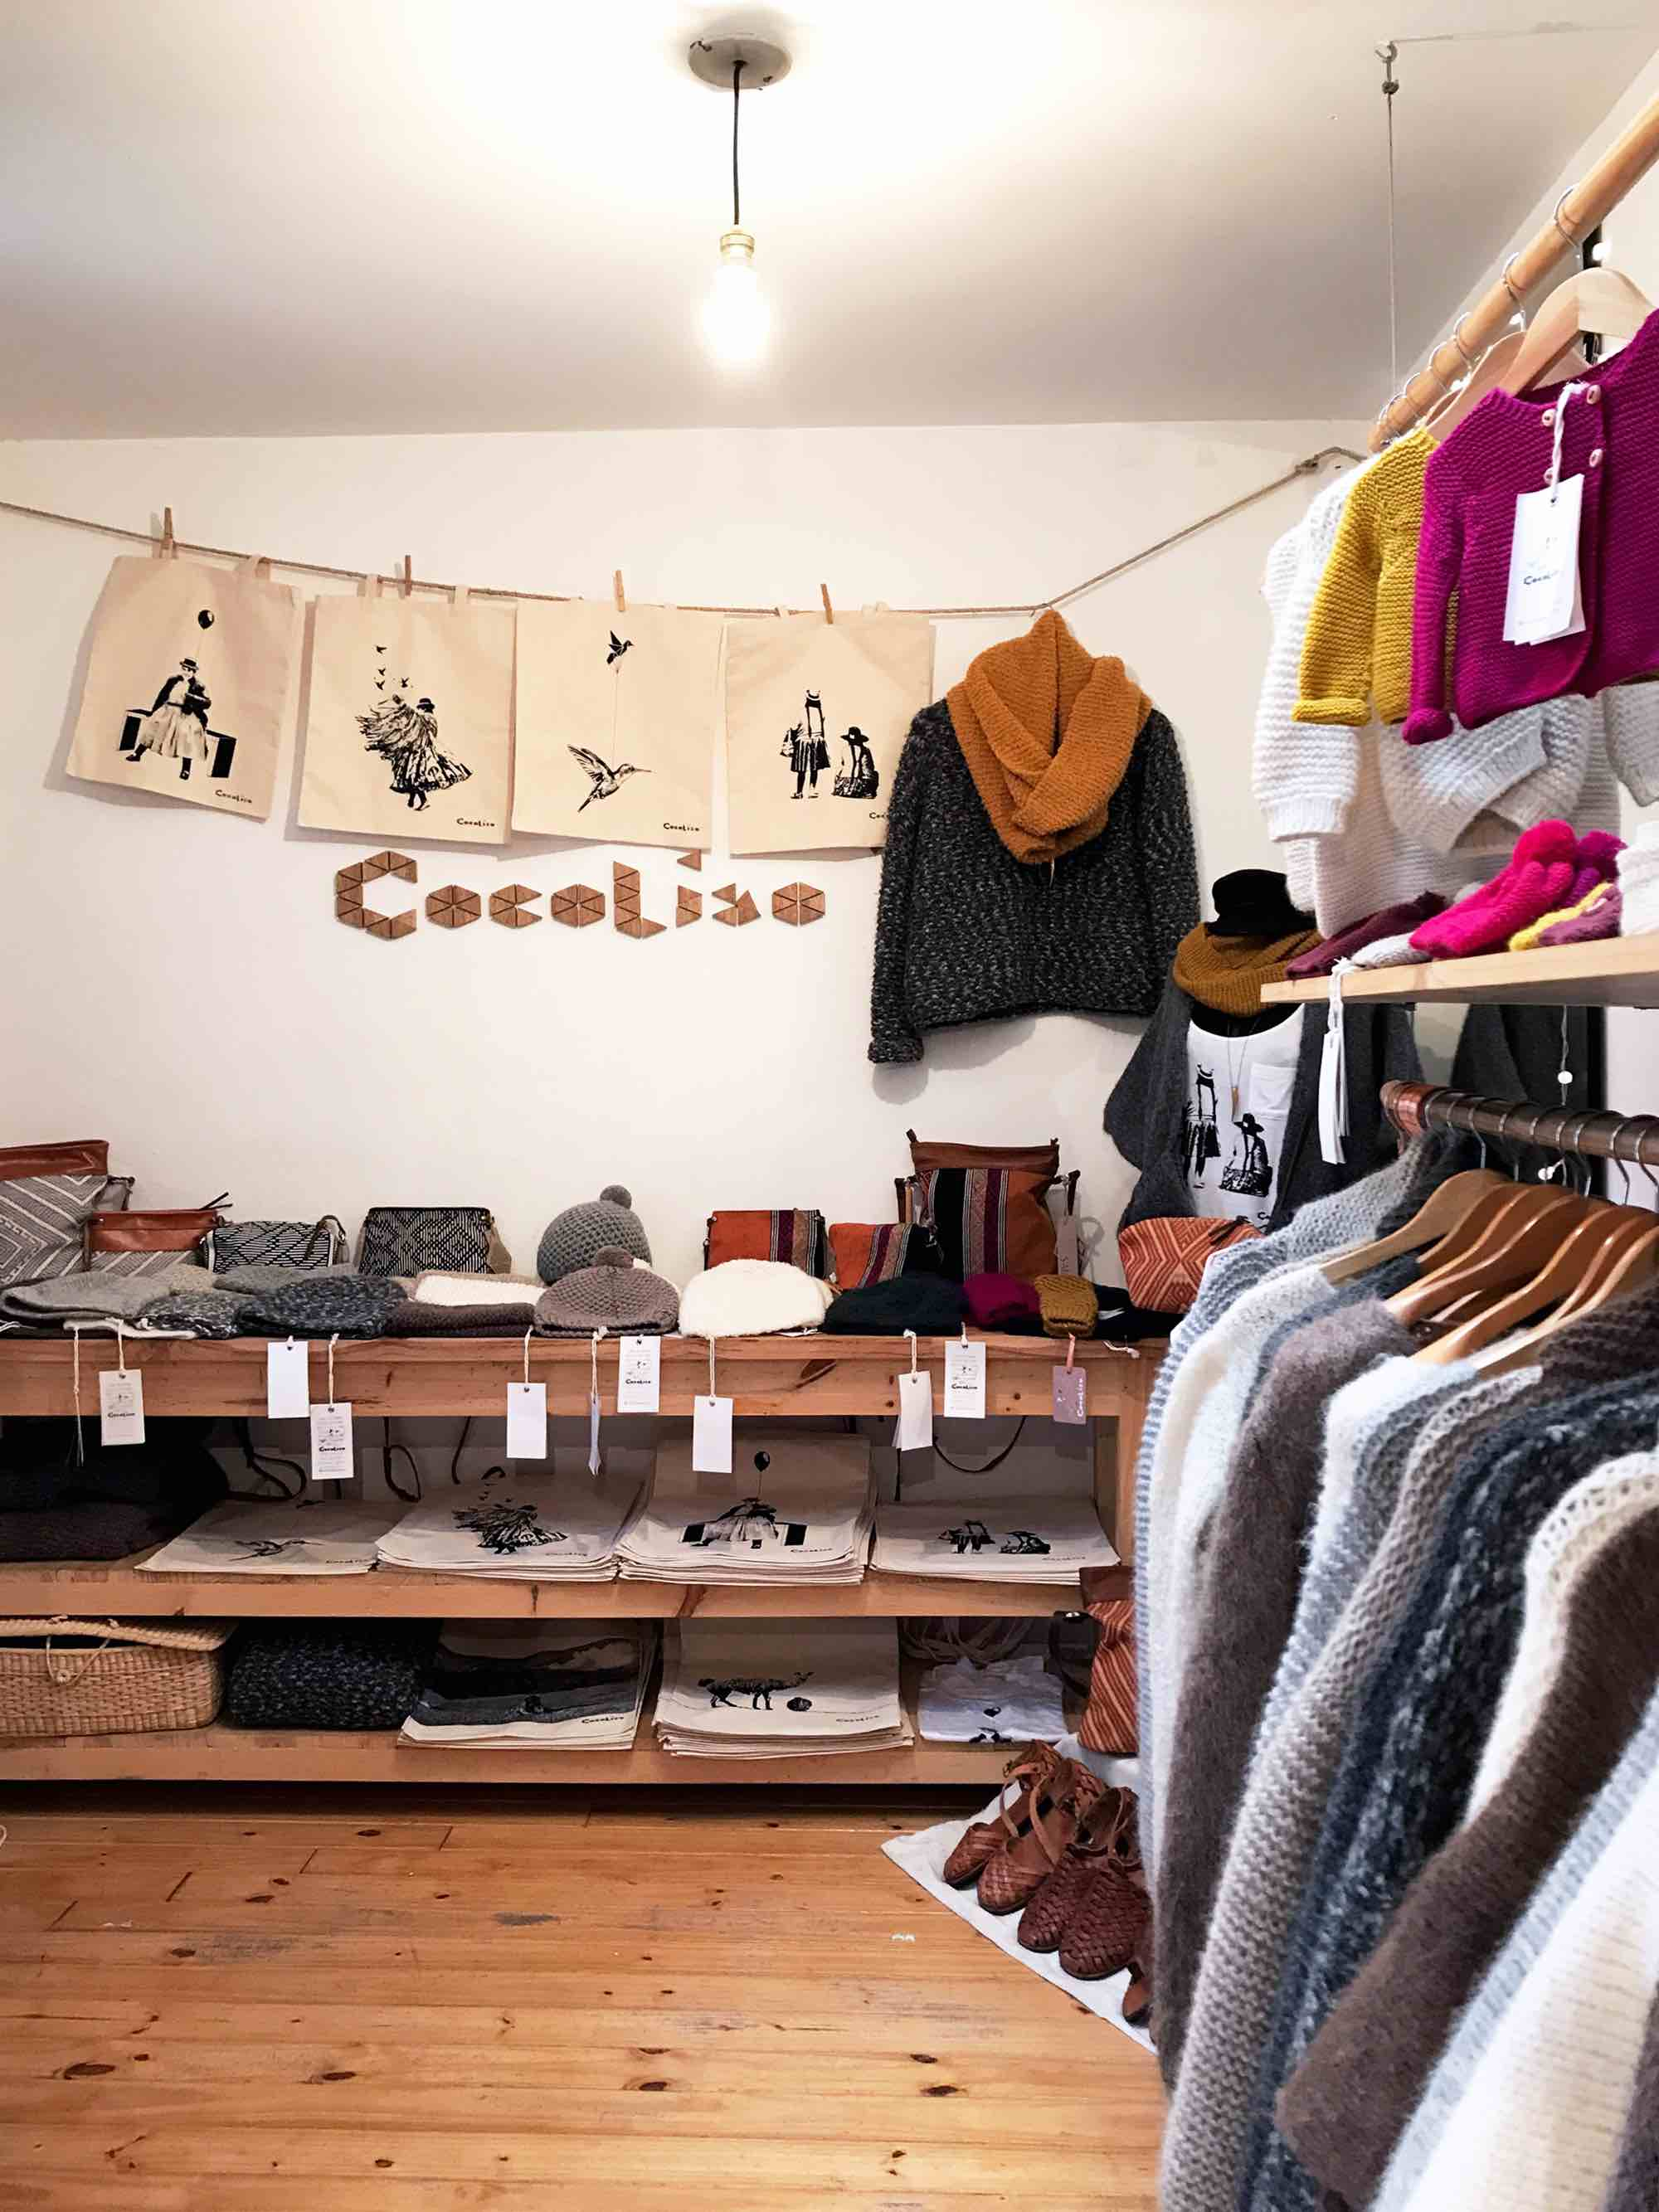 Chocoliso clothing boutique